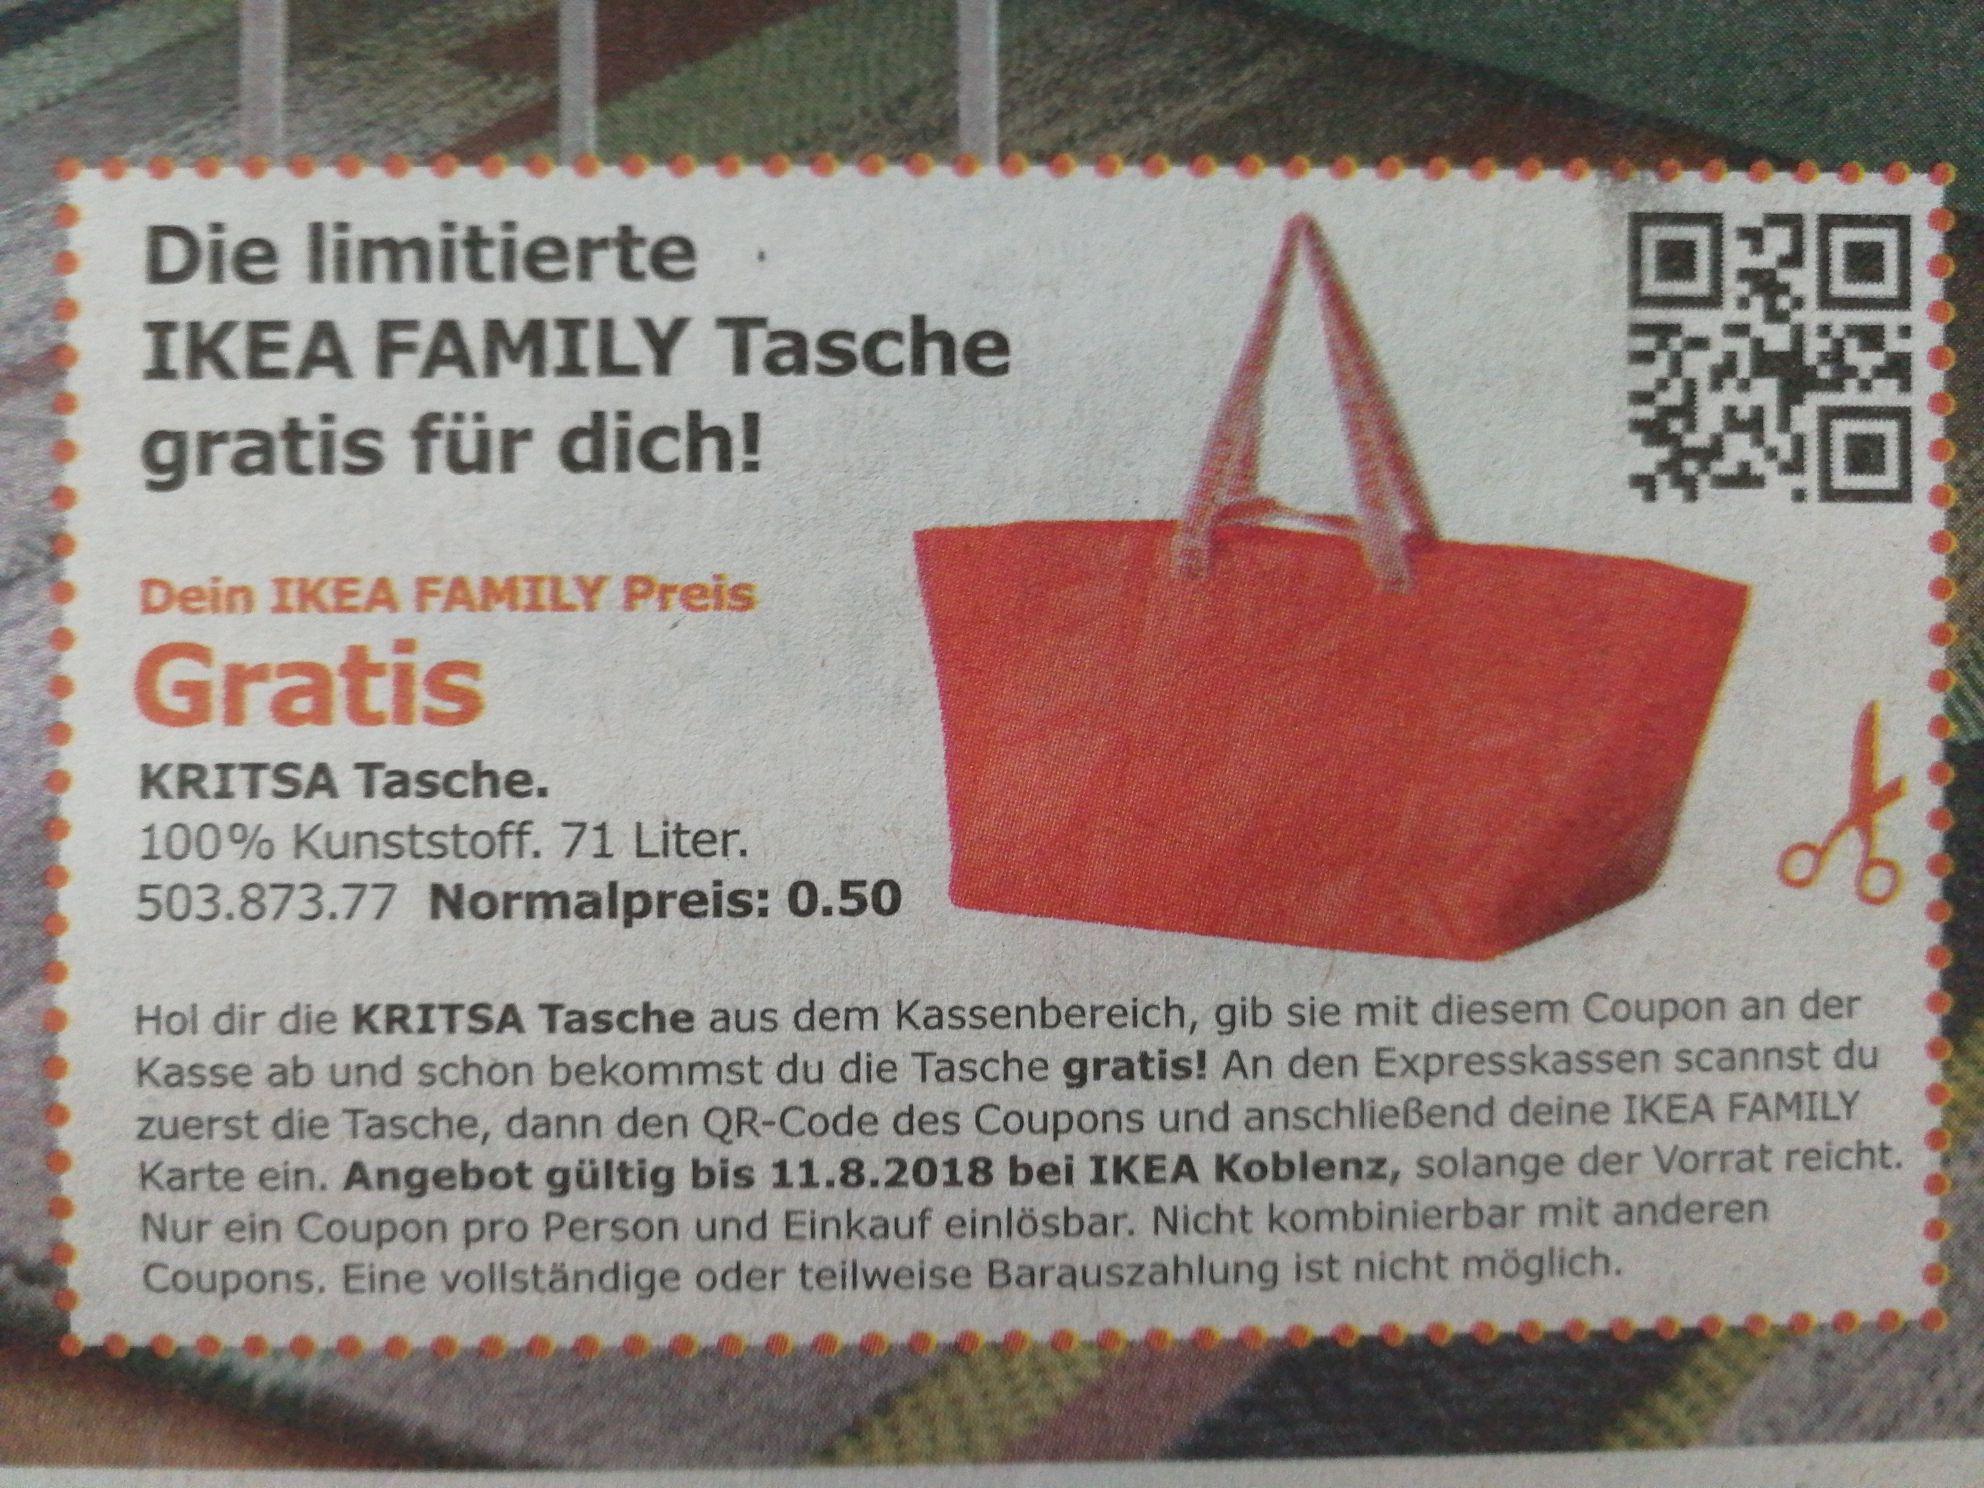 [lokal Koblenz?] Gratis Iimitierte Ikea Family Tasche durch Coupon in Super Sonntag/Am Wochenende (E-Paper)